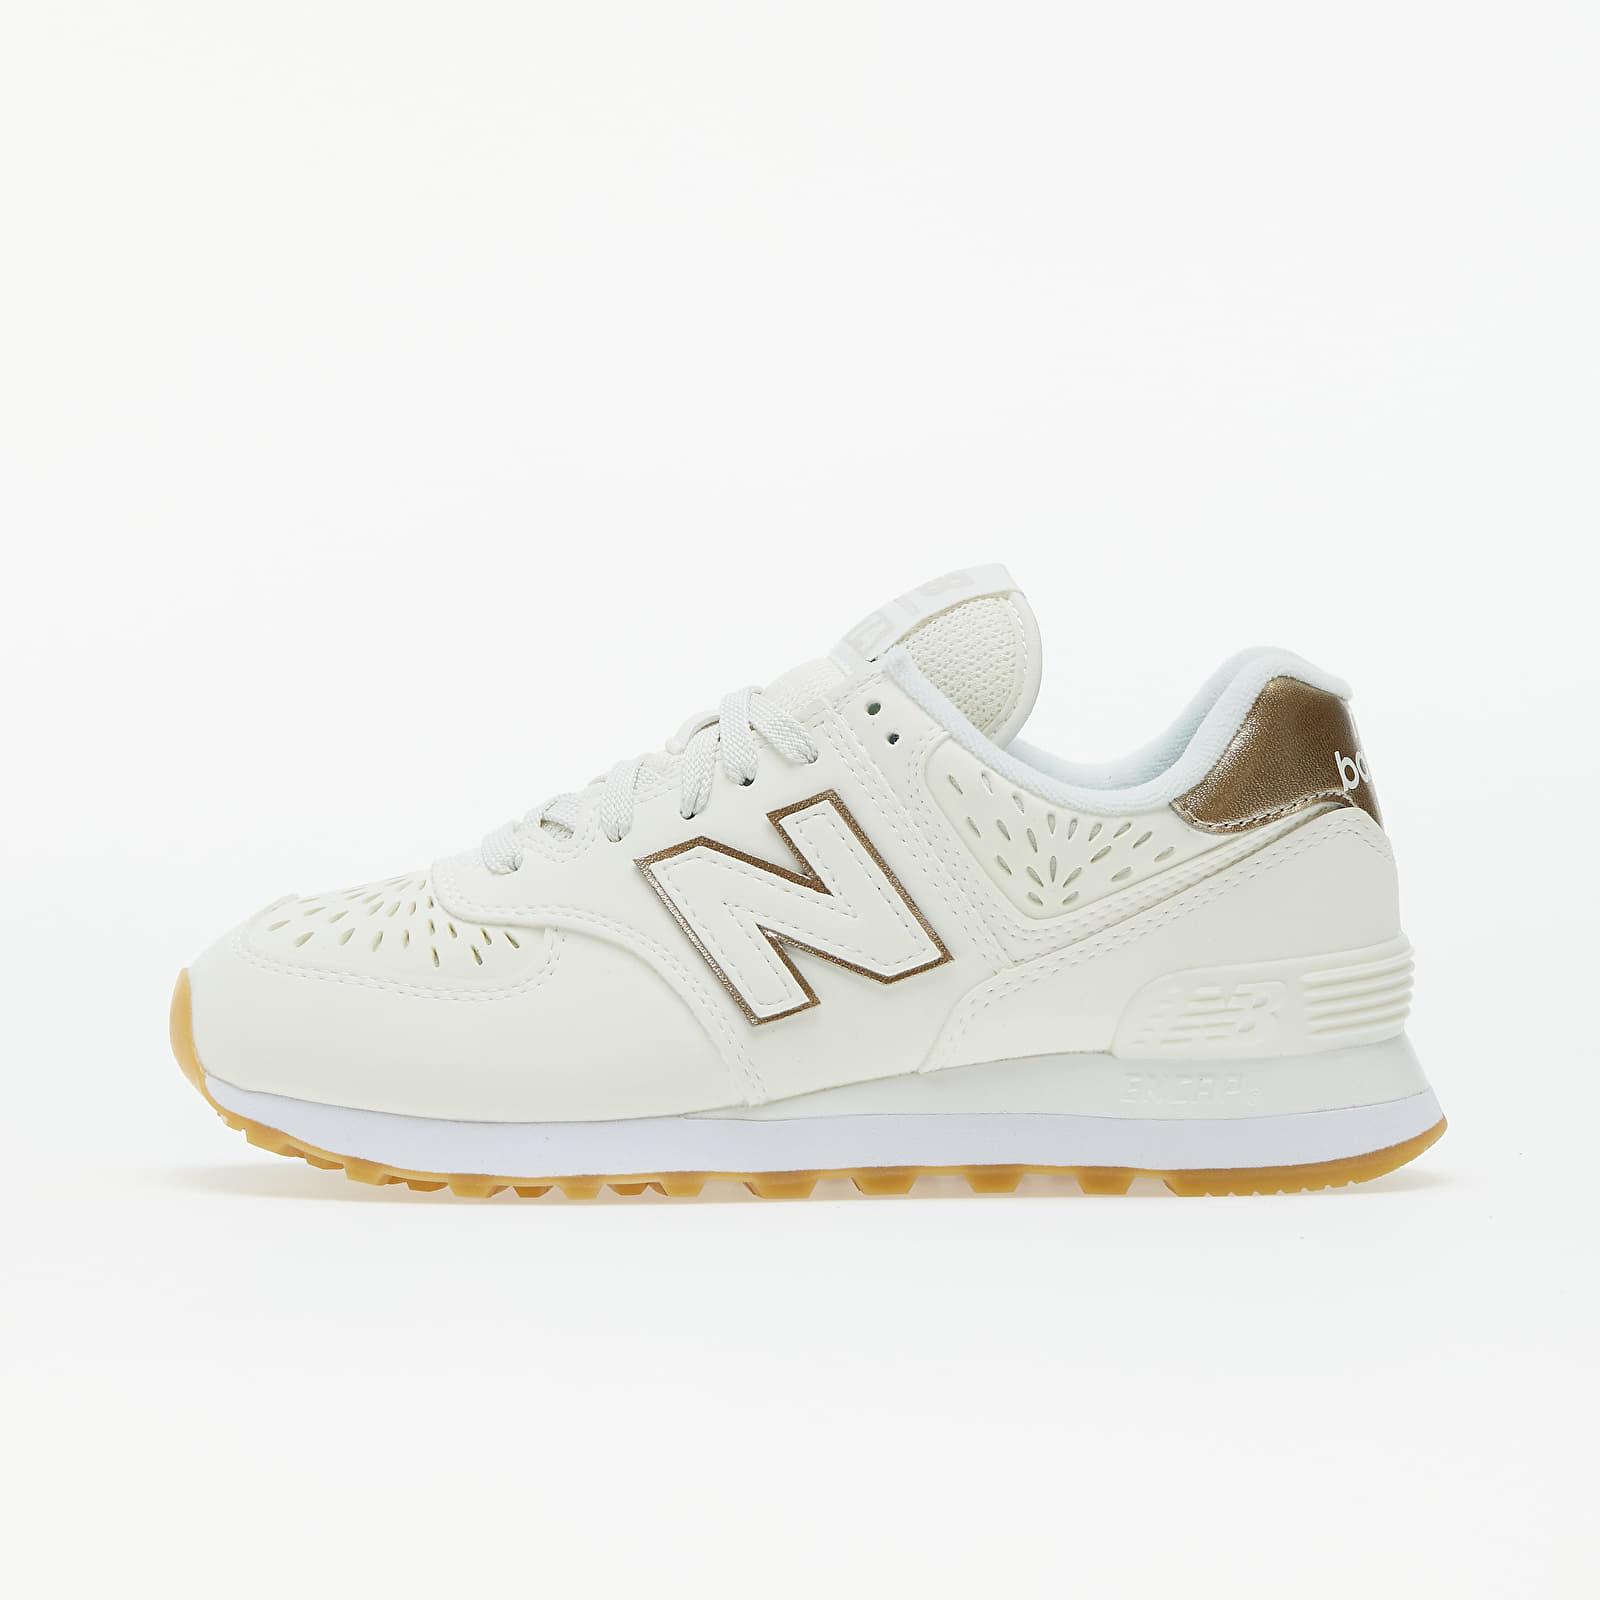 New Balance 574 EUR 40